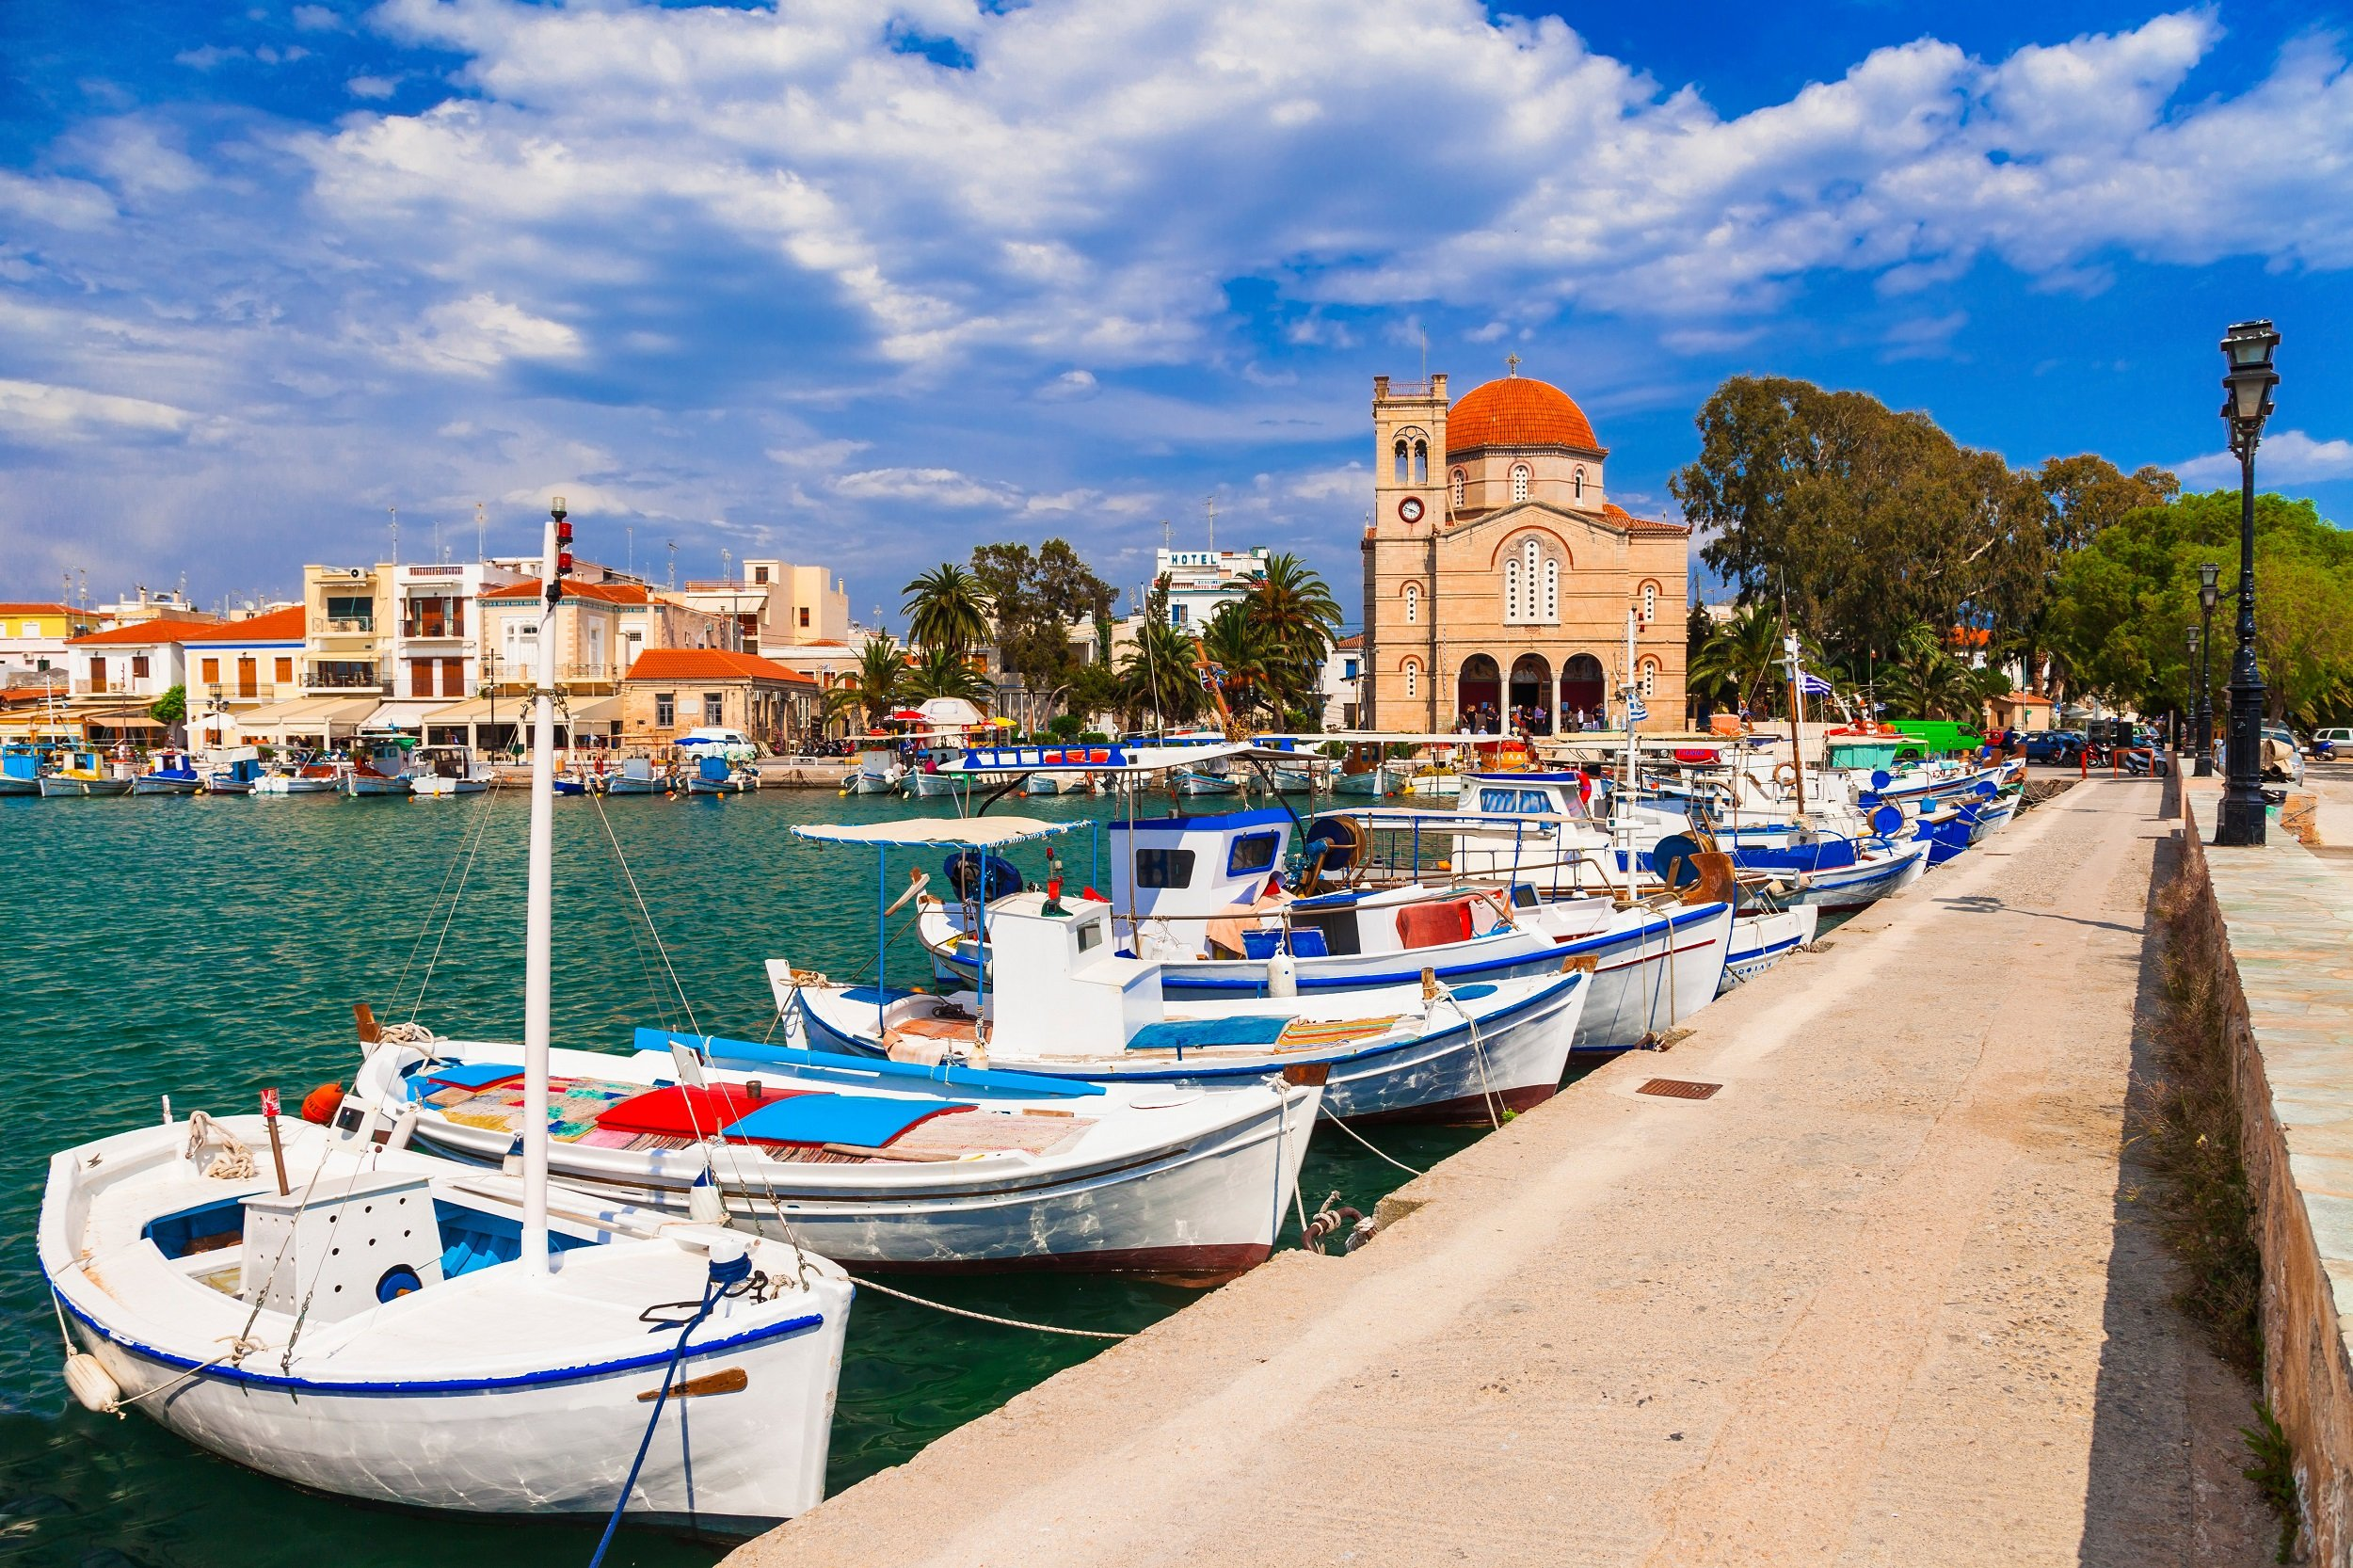 5 Day Athens, Delphi, Meteora & Aegina Off The Beaten Track Tour Package_aegina